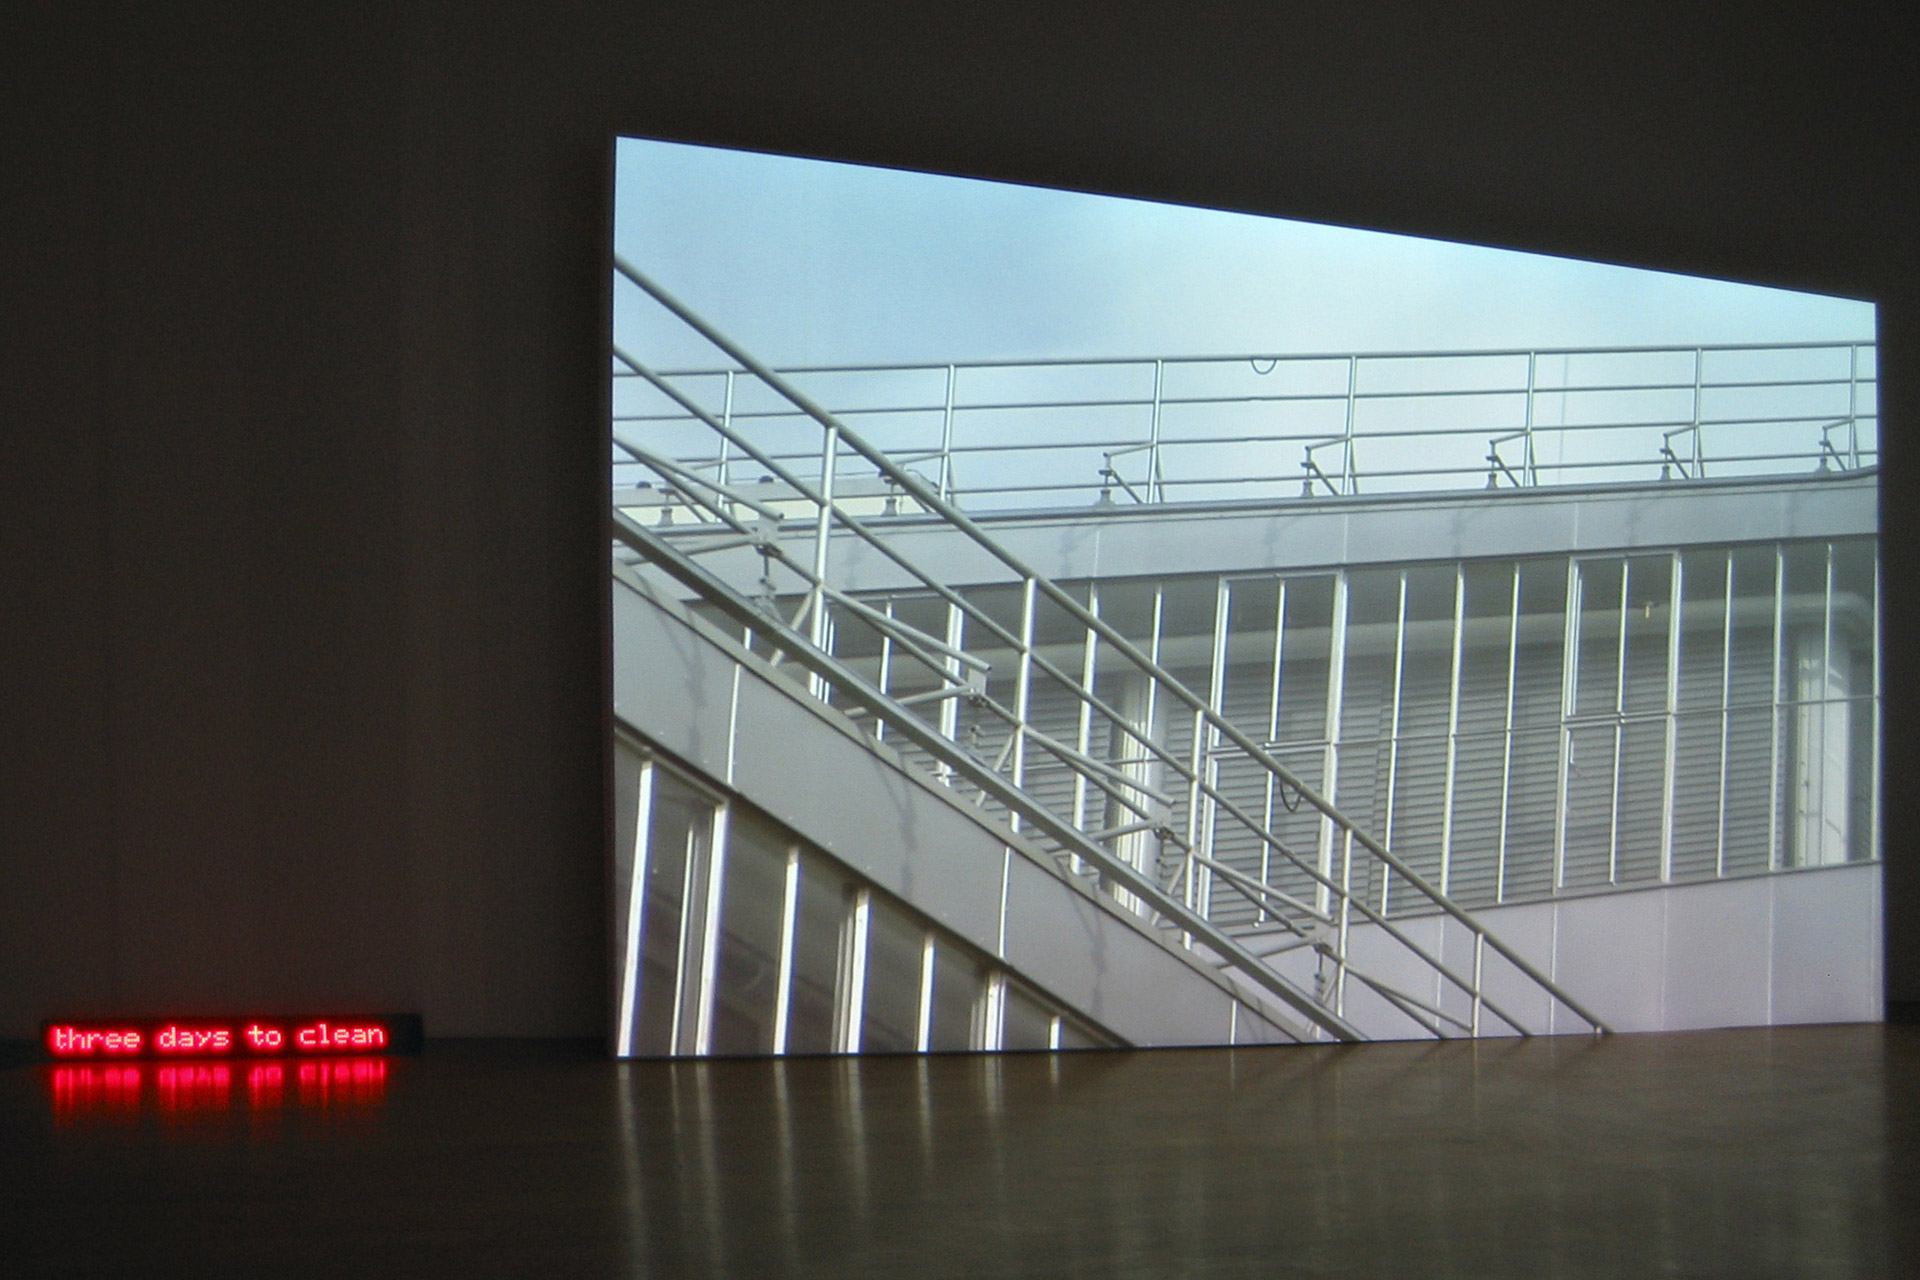 Aleksander-Komarov-Kunsthalle-Winterthur-1.jpg